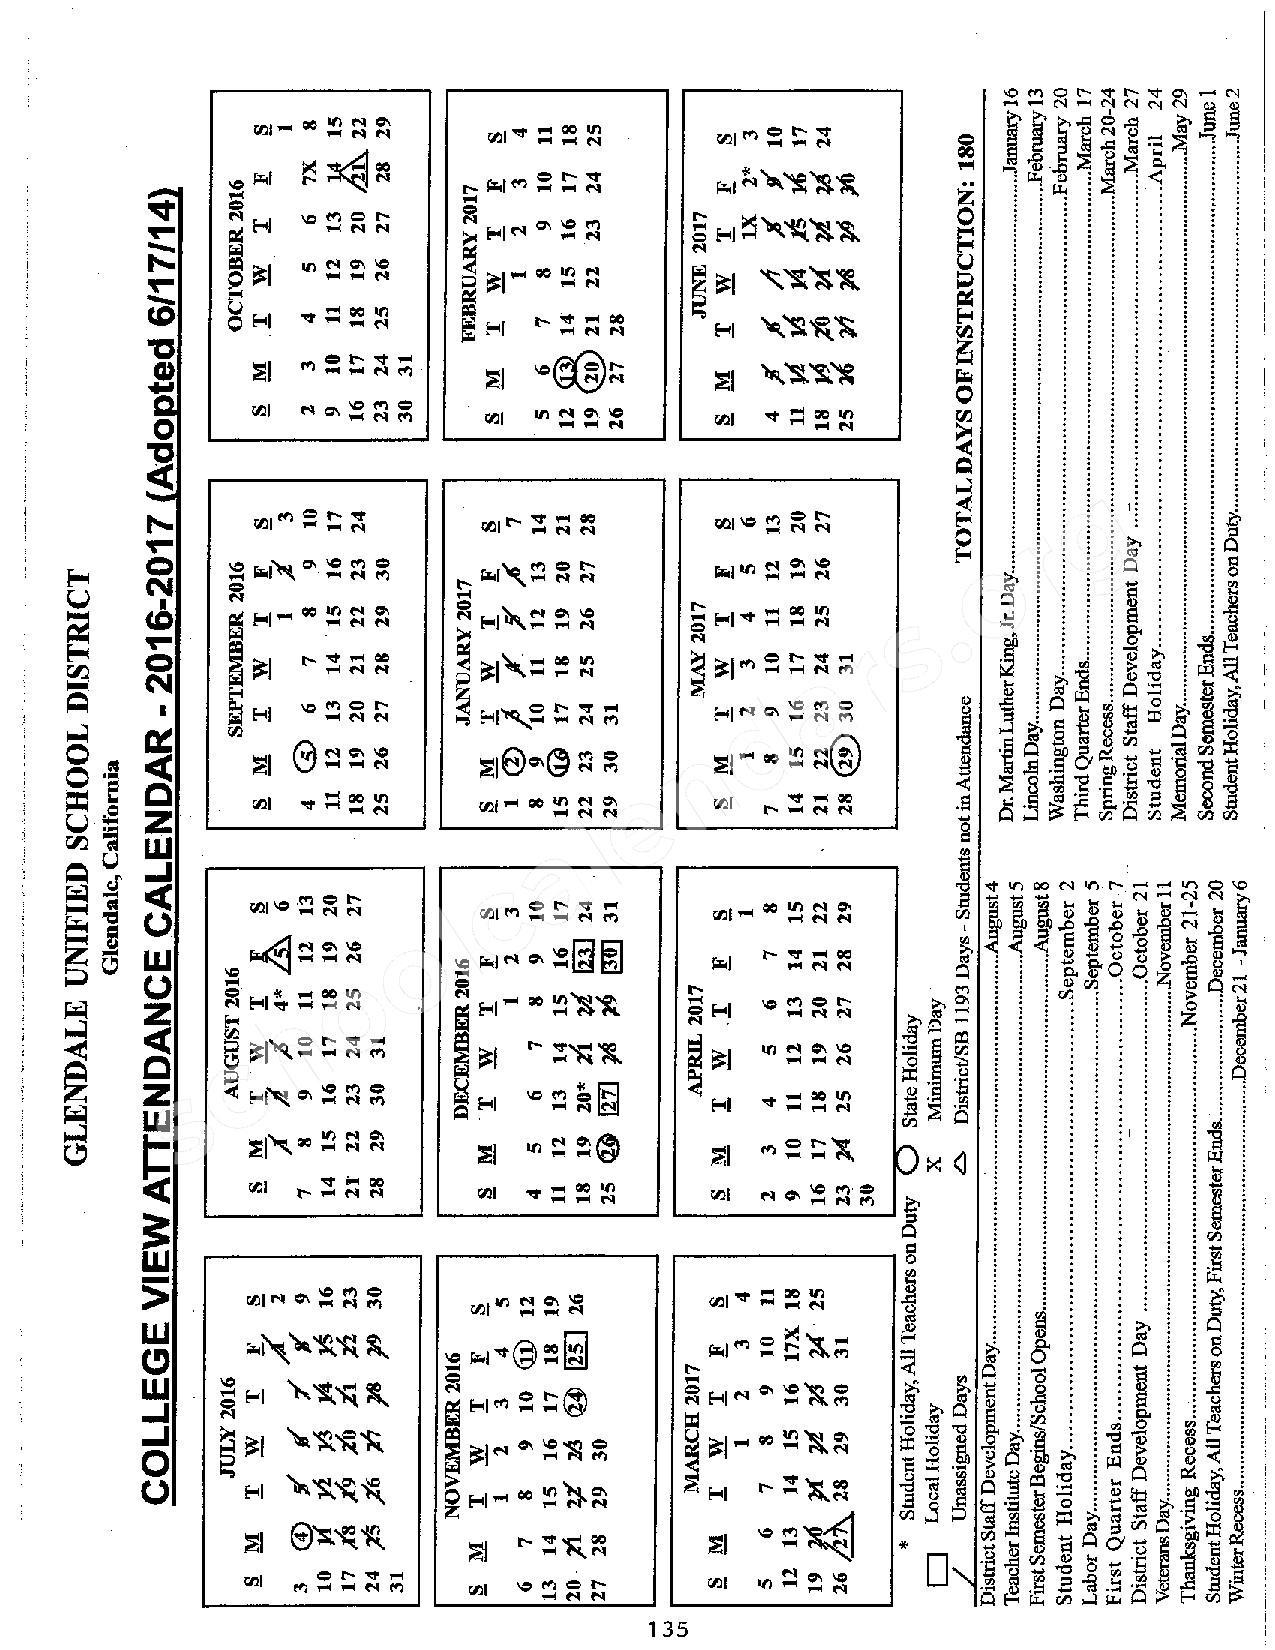 Glendale Unified School District Calendar | Calendar Fall 2020